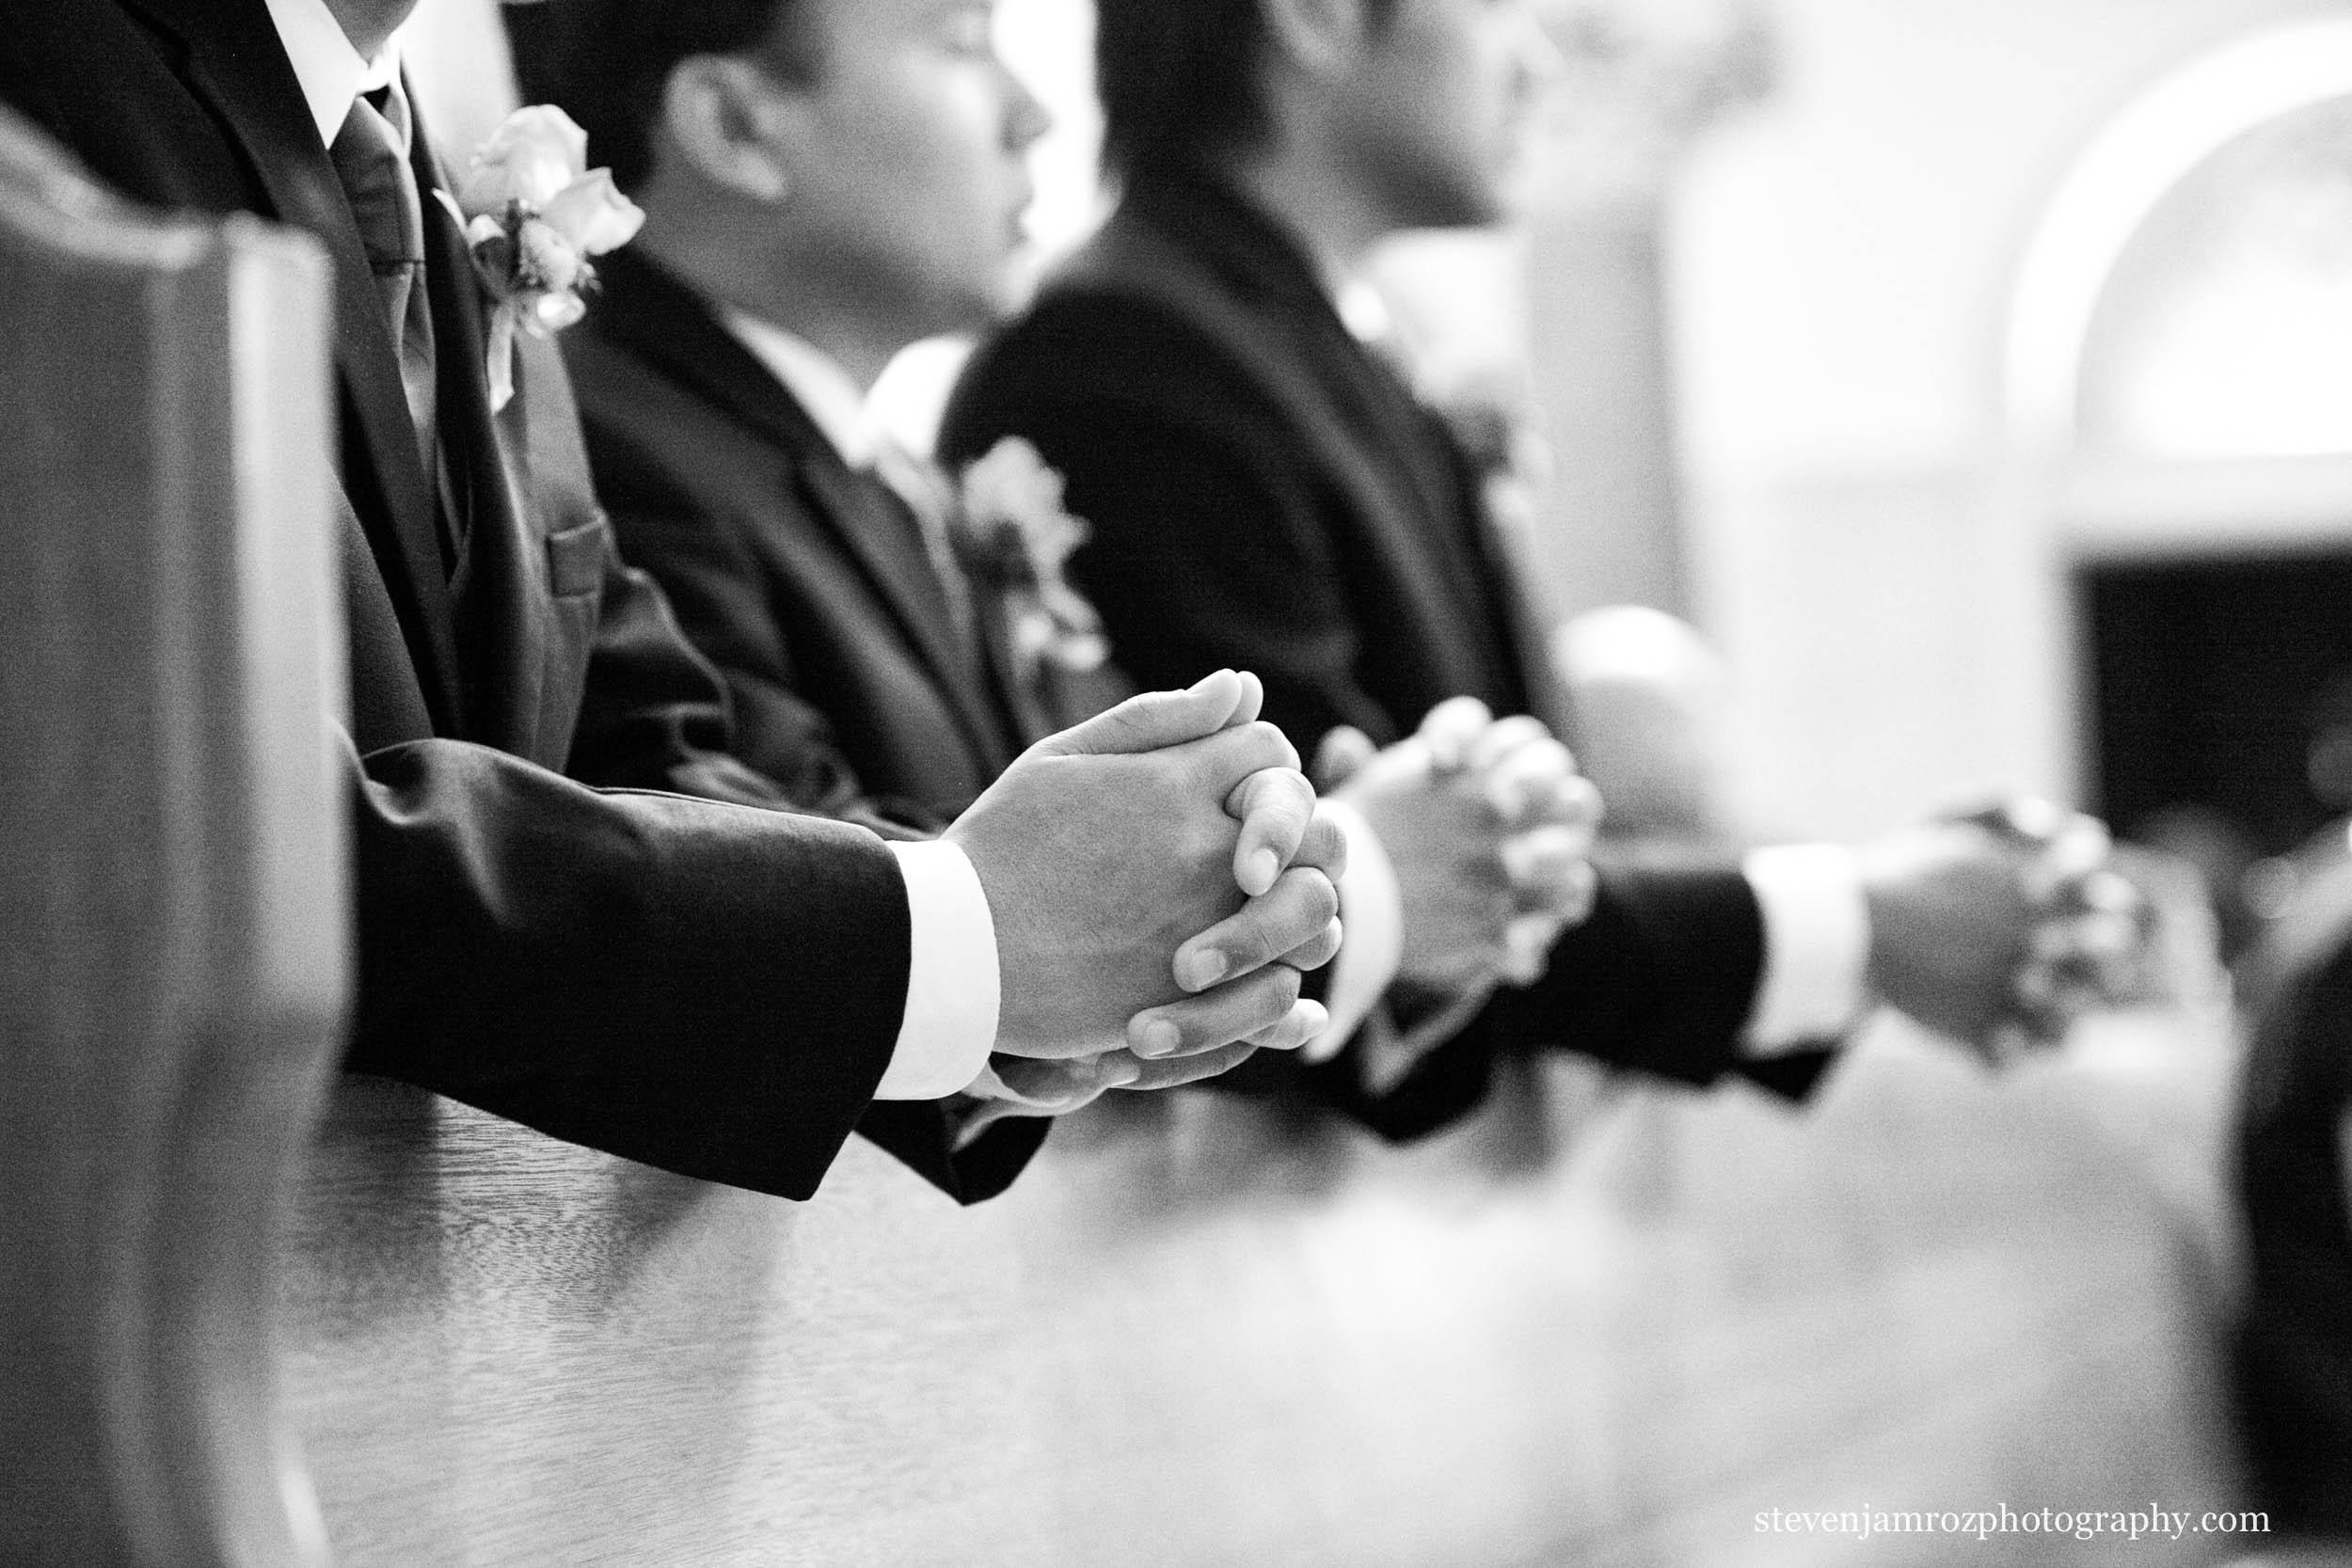 kneeling-groomsmen-wedding-steven-jamroz-photography-0482.jpg